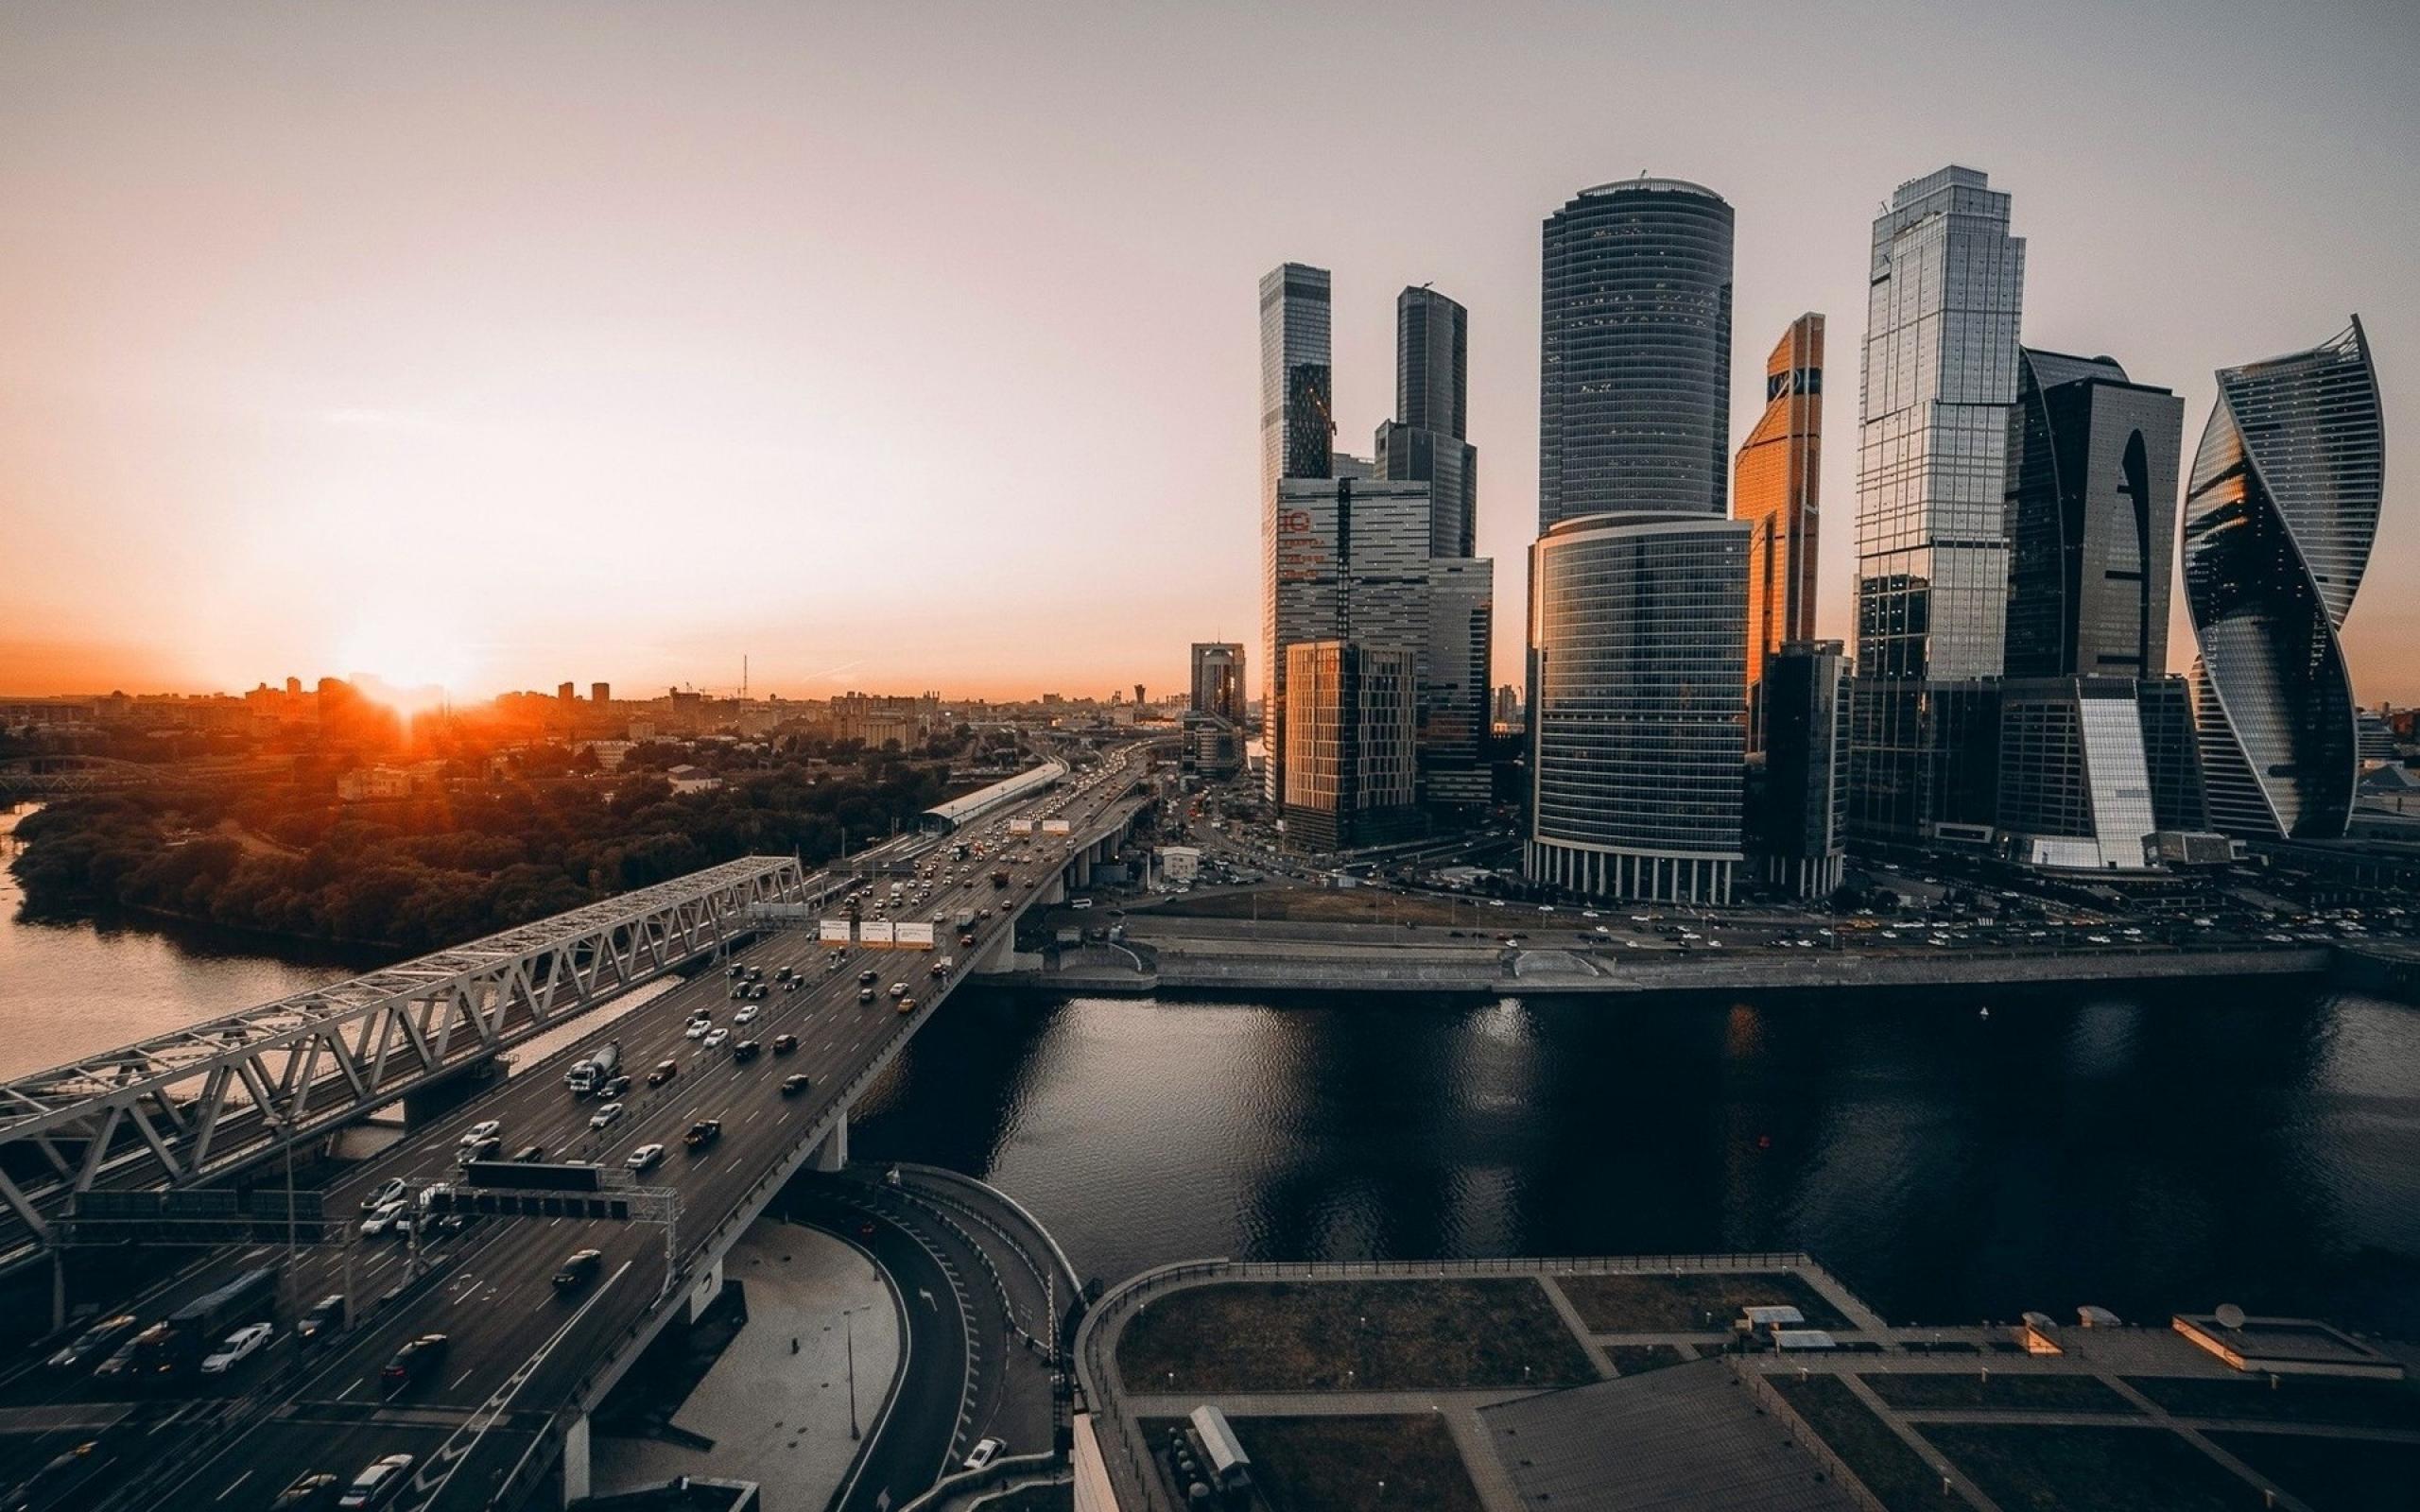 Апартаменты в «Москва-Сити» подорожали